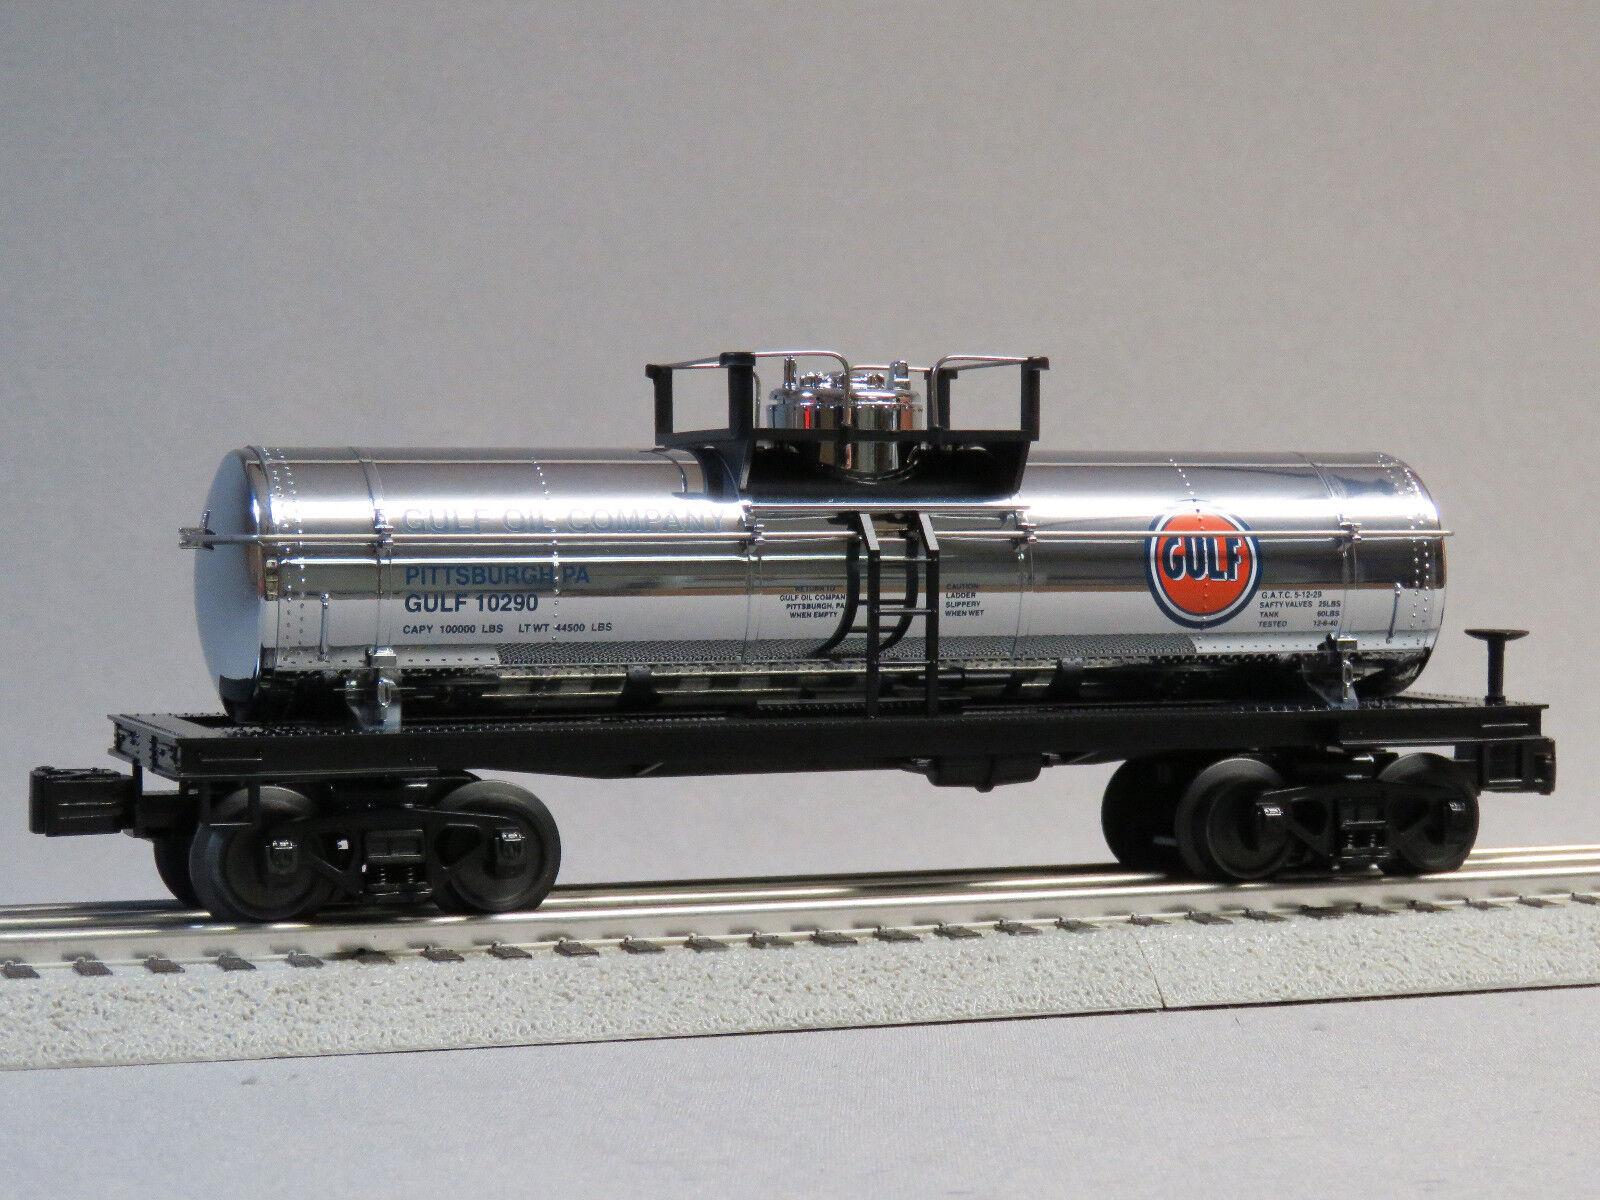 MTH RAIL KING GULF TANK CAR 10290 O GAUGE train Pittsburgh PA 30-4244-1-T NEW